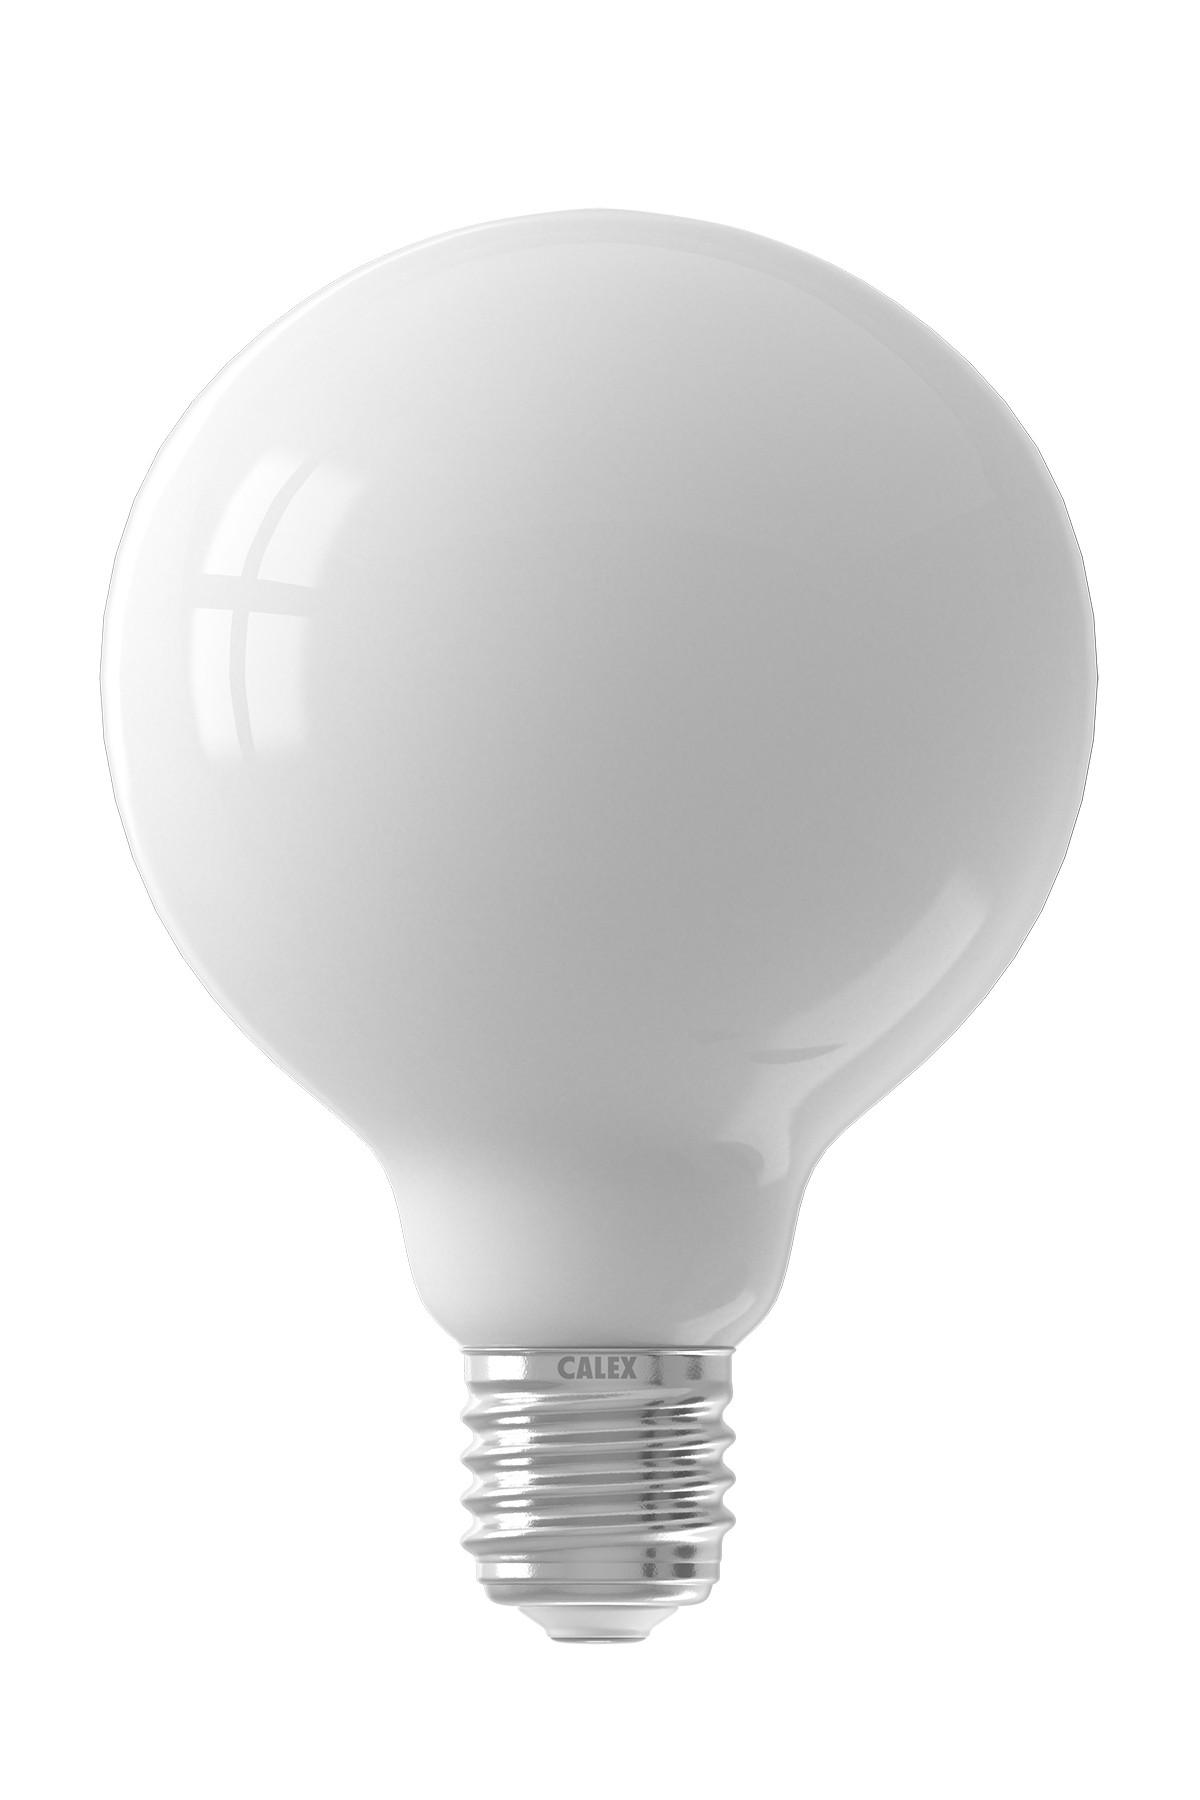 Filament LED Dimmable Globe Lamp 240V 8W E27